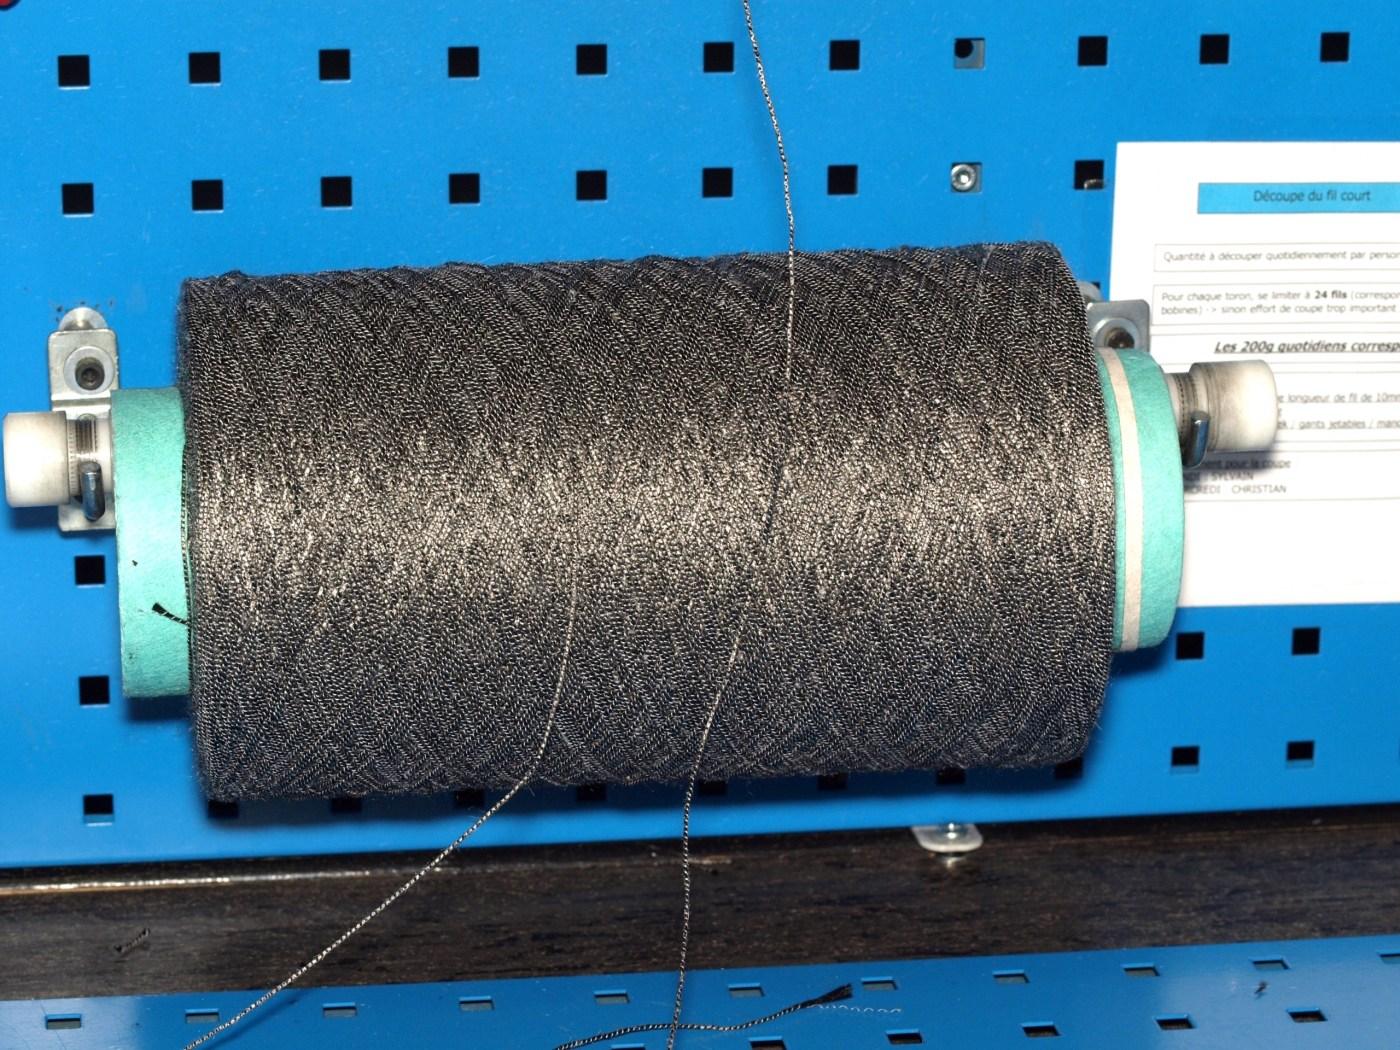 Roll of raw carbon fiber thread